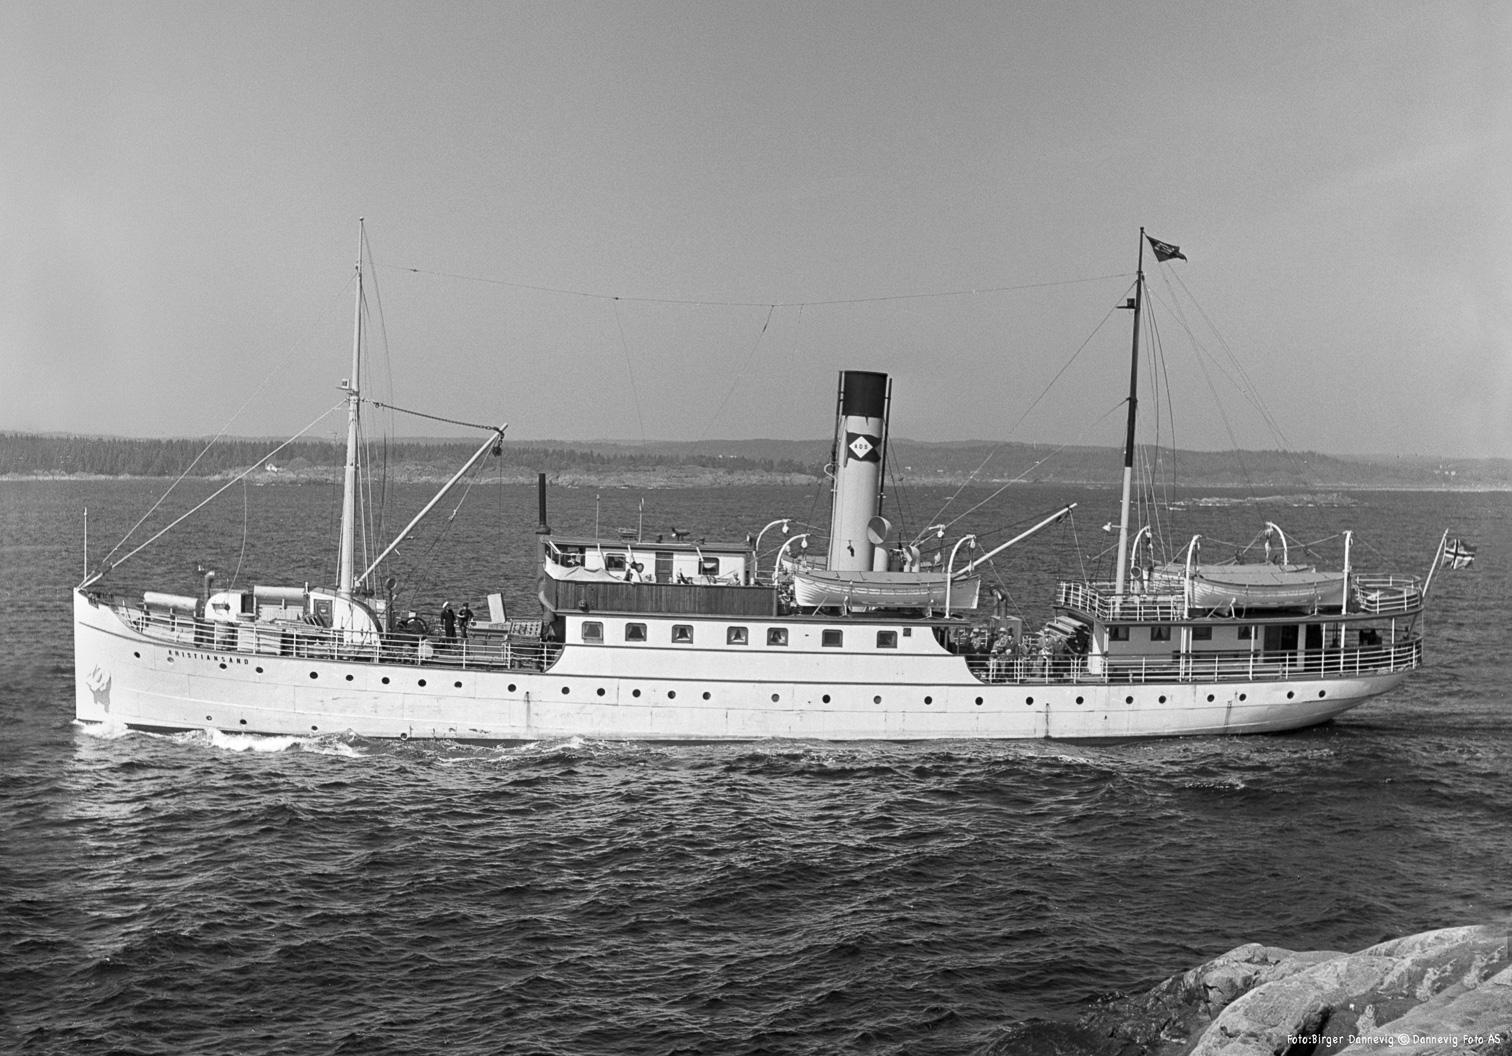 SS Kristiansand II